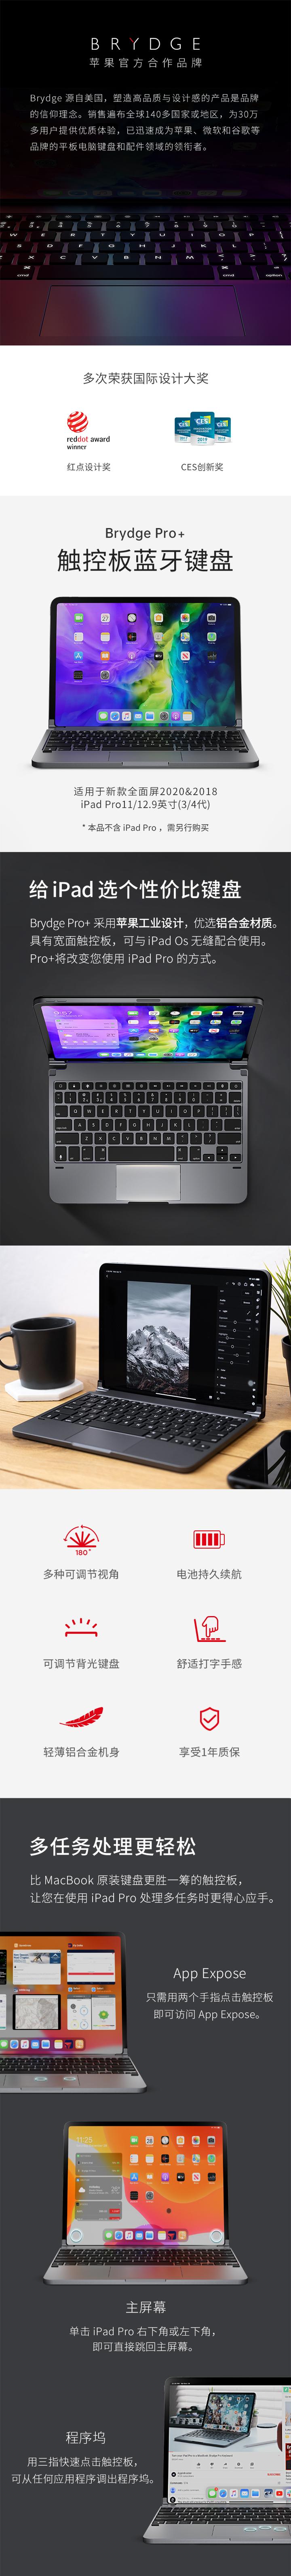 Brydge触控板iPad键盘免费试用,评测